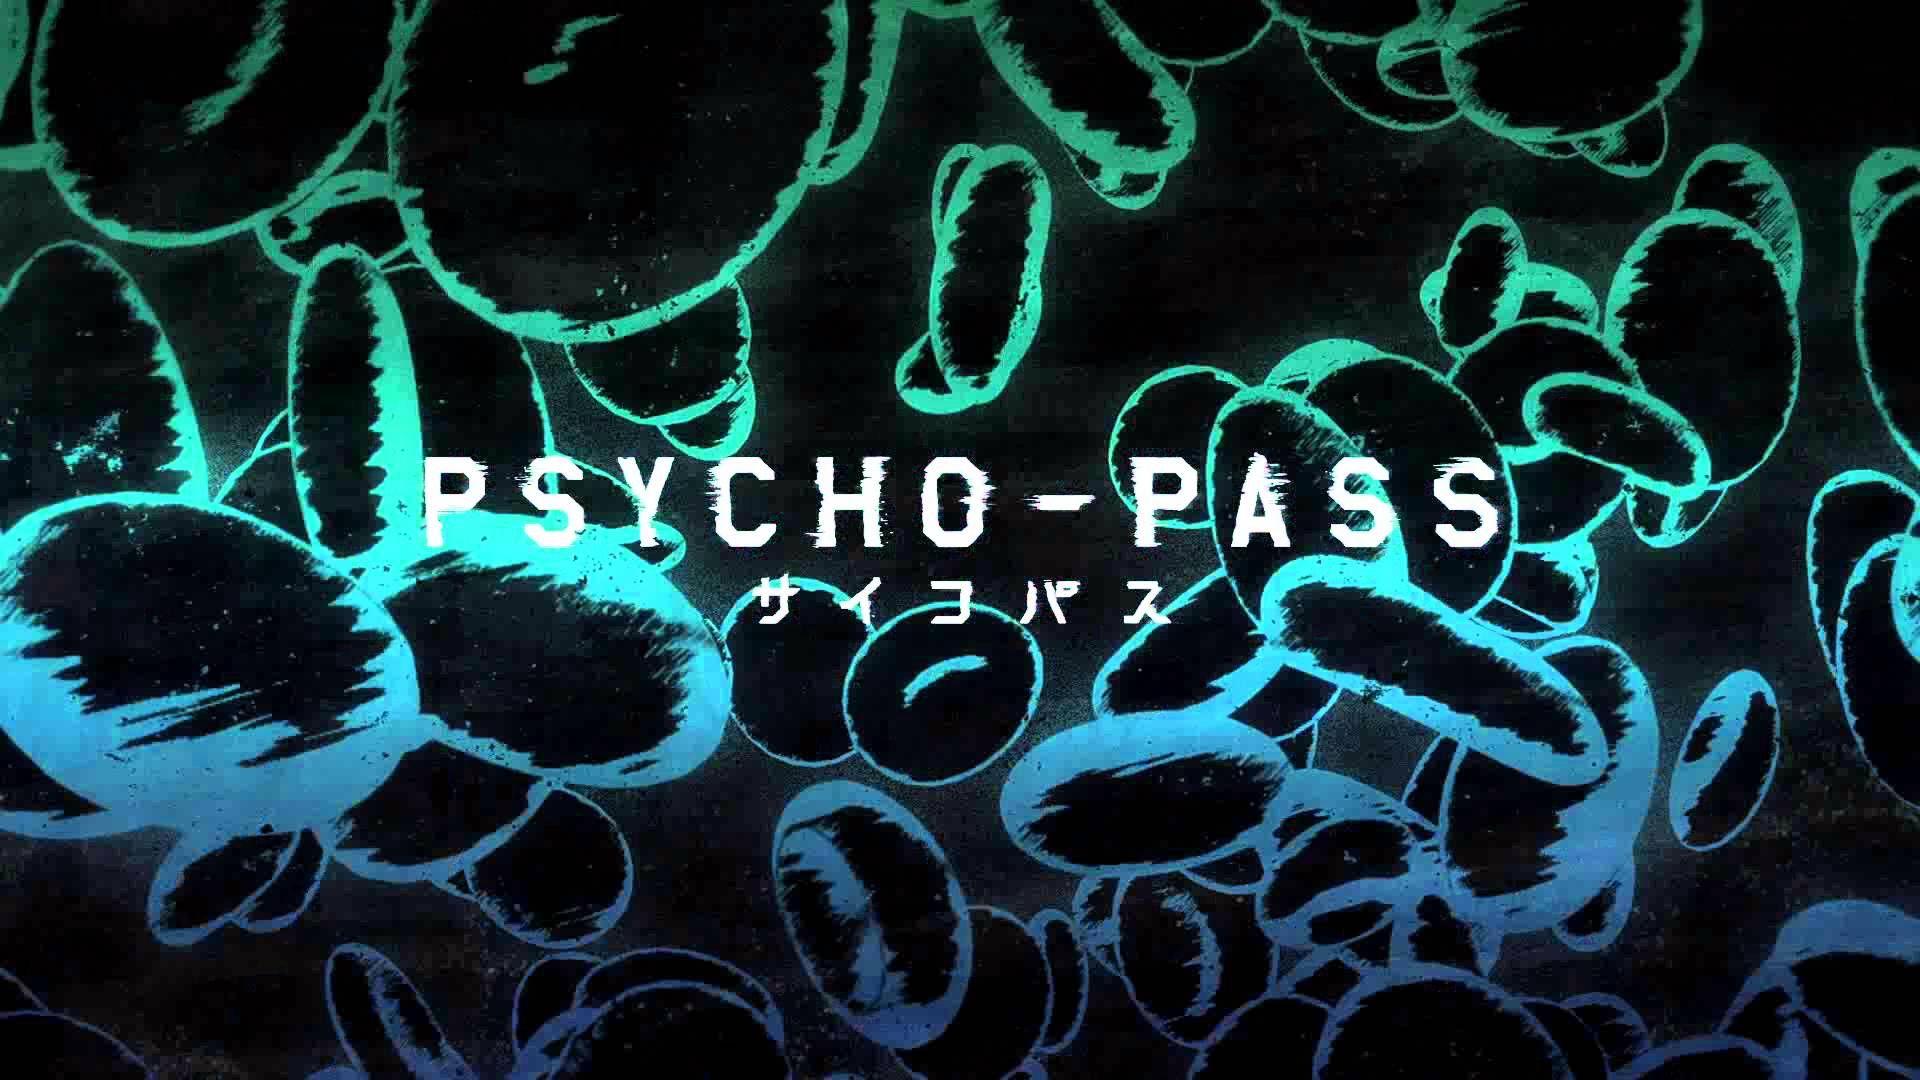 PsychoPass Wallpapers/Screensavers Part VI. サイコパス, 壁紙